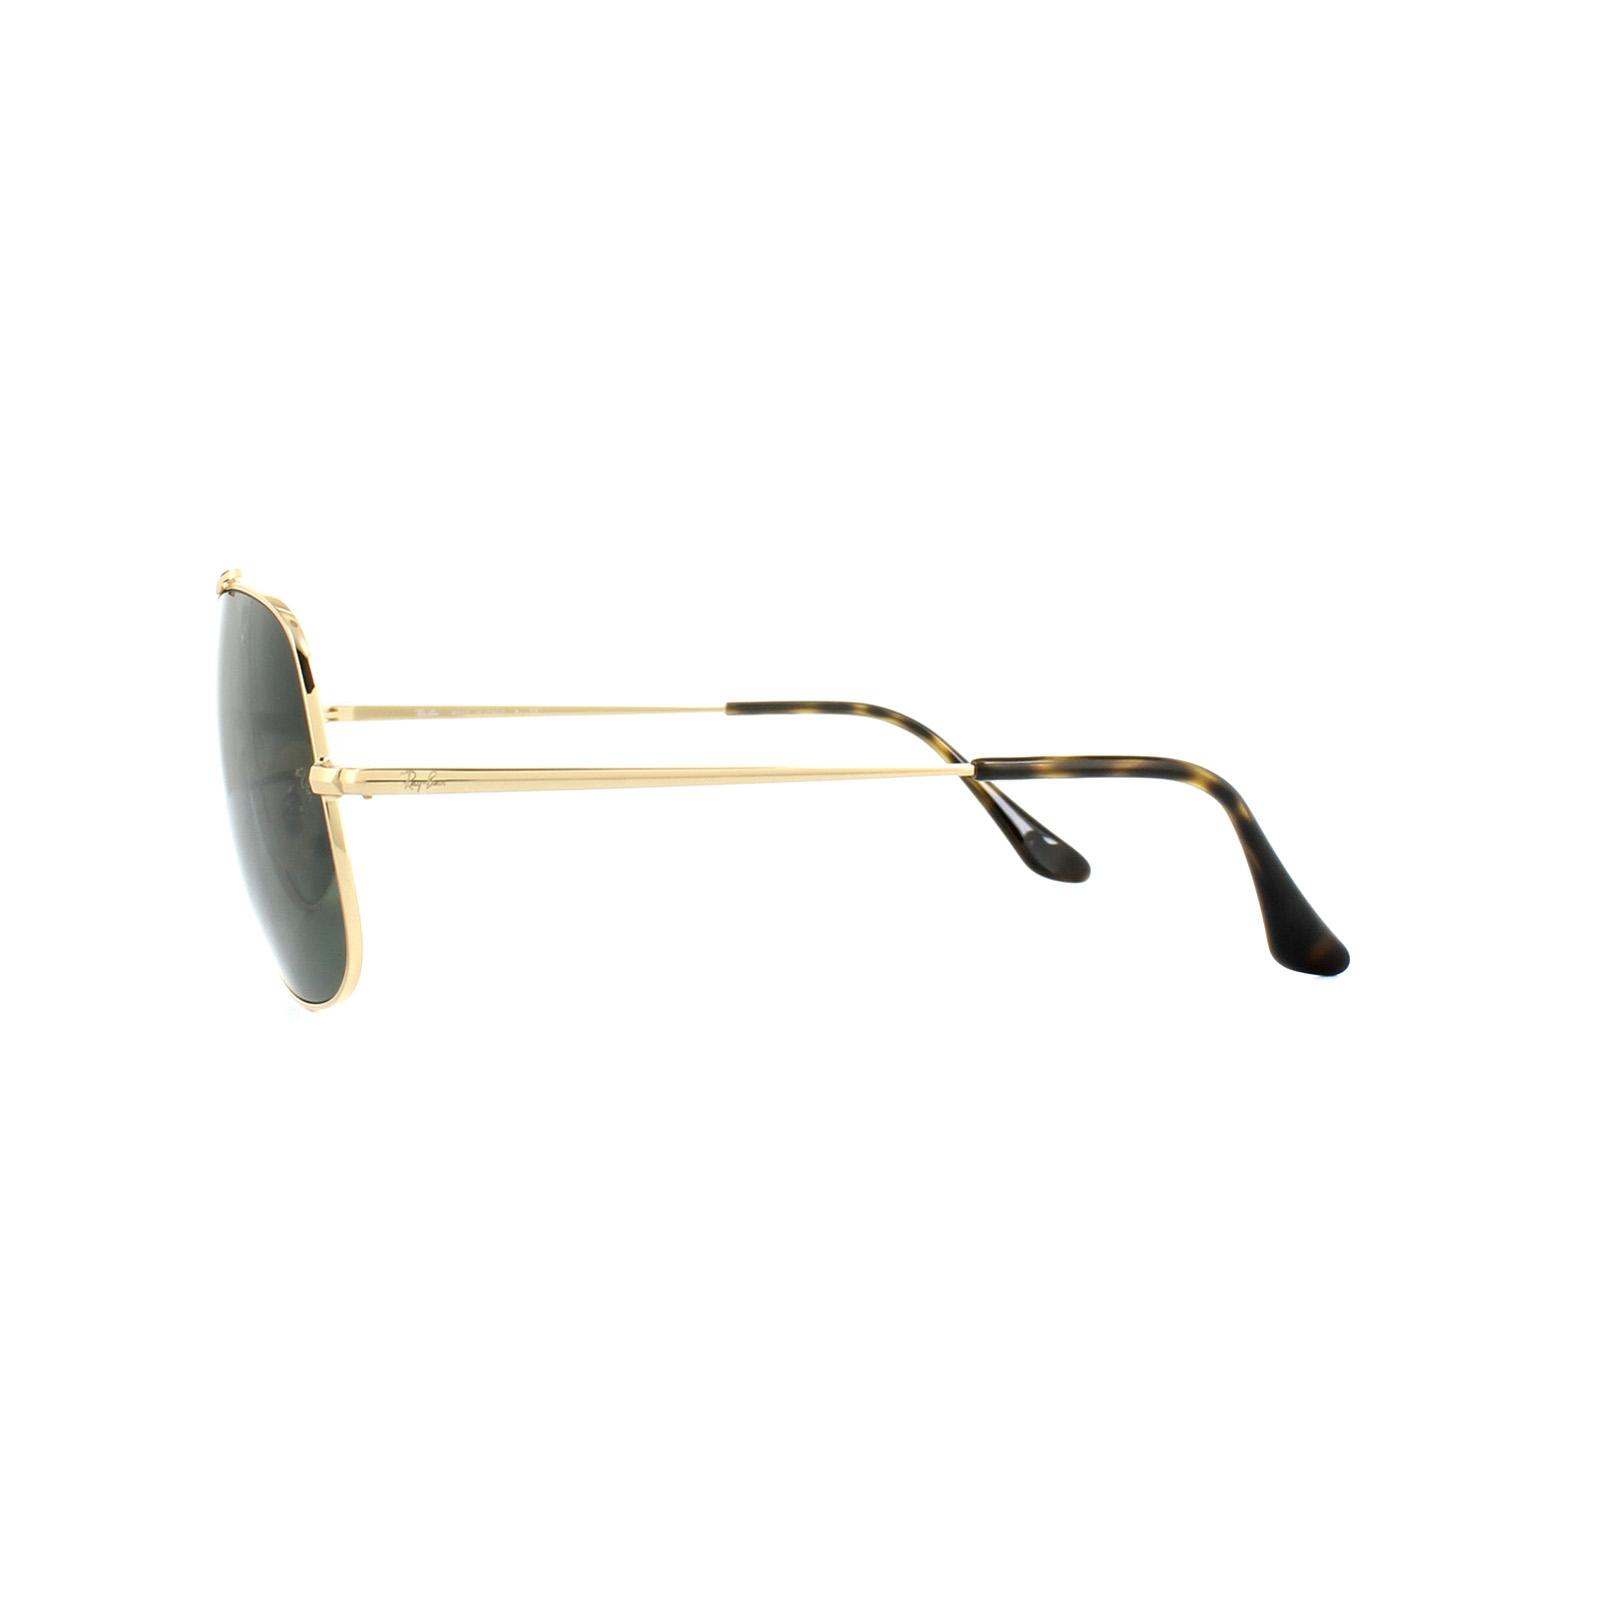 b467280f3b Cheap Ray-Ban General 3561 Sunglasses - Discounted Sunglasses